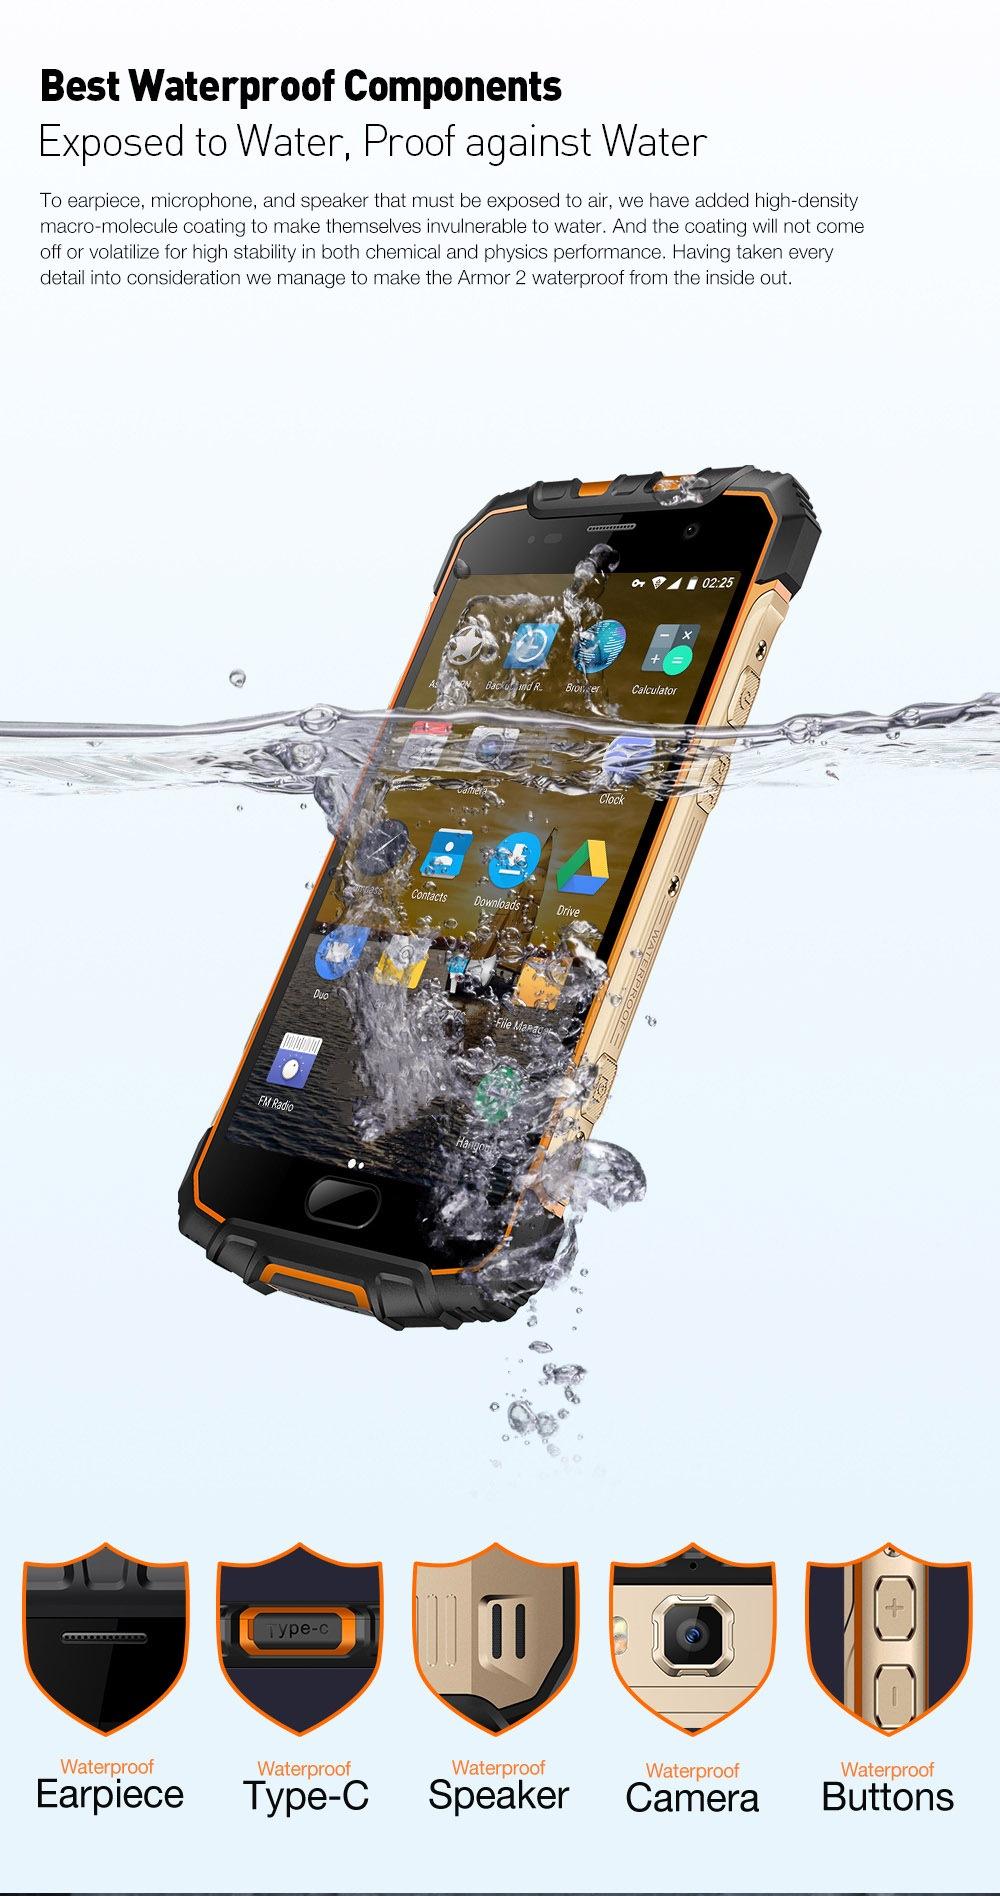 Ulefone Armor 2 4G okostelefon Android 7.0 5.0 hüvelykes Helio P25 Octa Core 2.6GHz 6GB RAM 64GB ROM IP68 Vízálló NFC 16.0MP hátsó kamera - Emerald Green